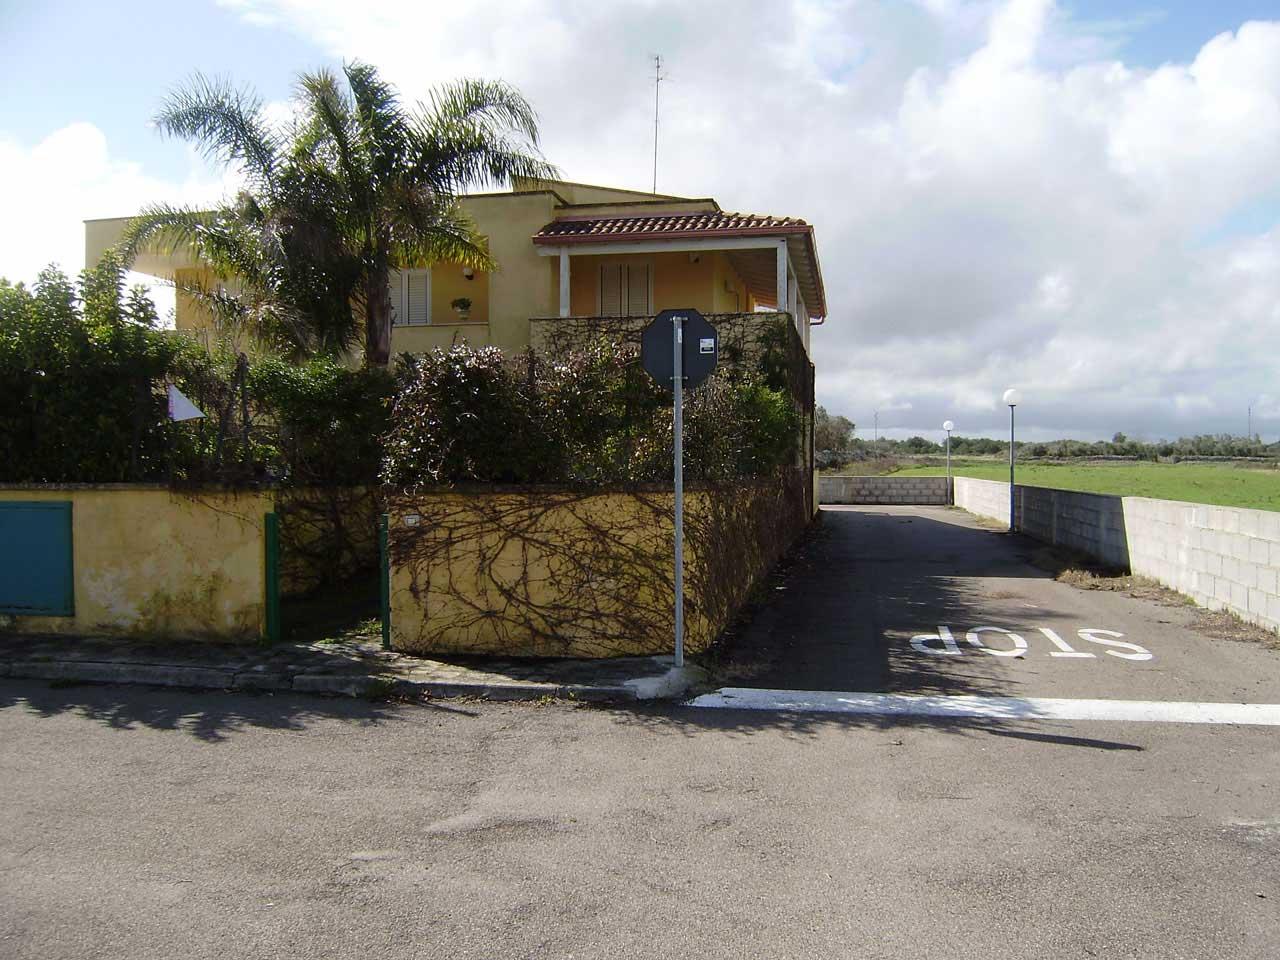 Cod. V 054 Torre Saracena Villetta su due livelli giardino ant. e post.